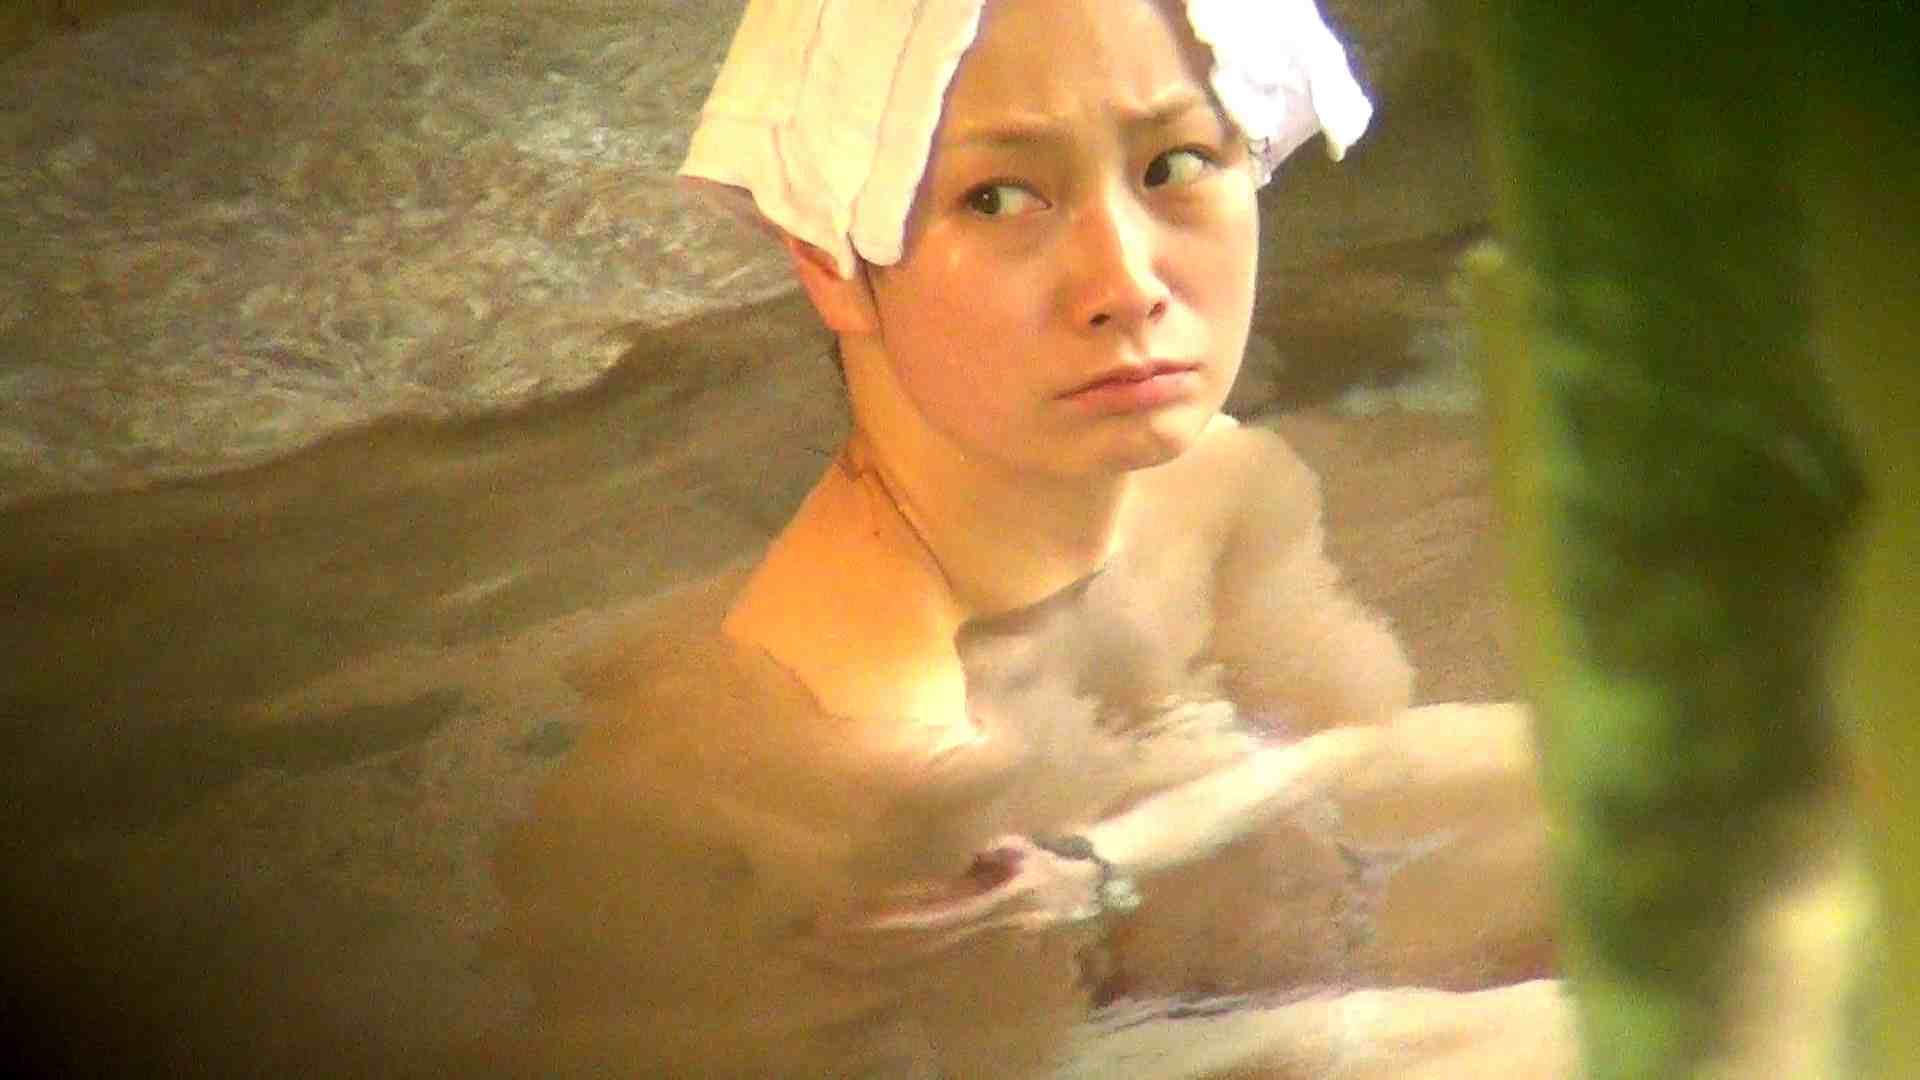 Aquaな露天風呂Vol.266 盗撮映像  83Pix 79